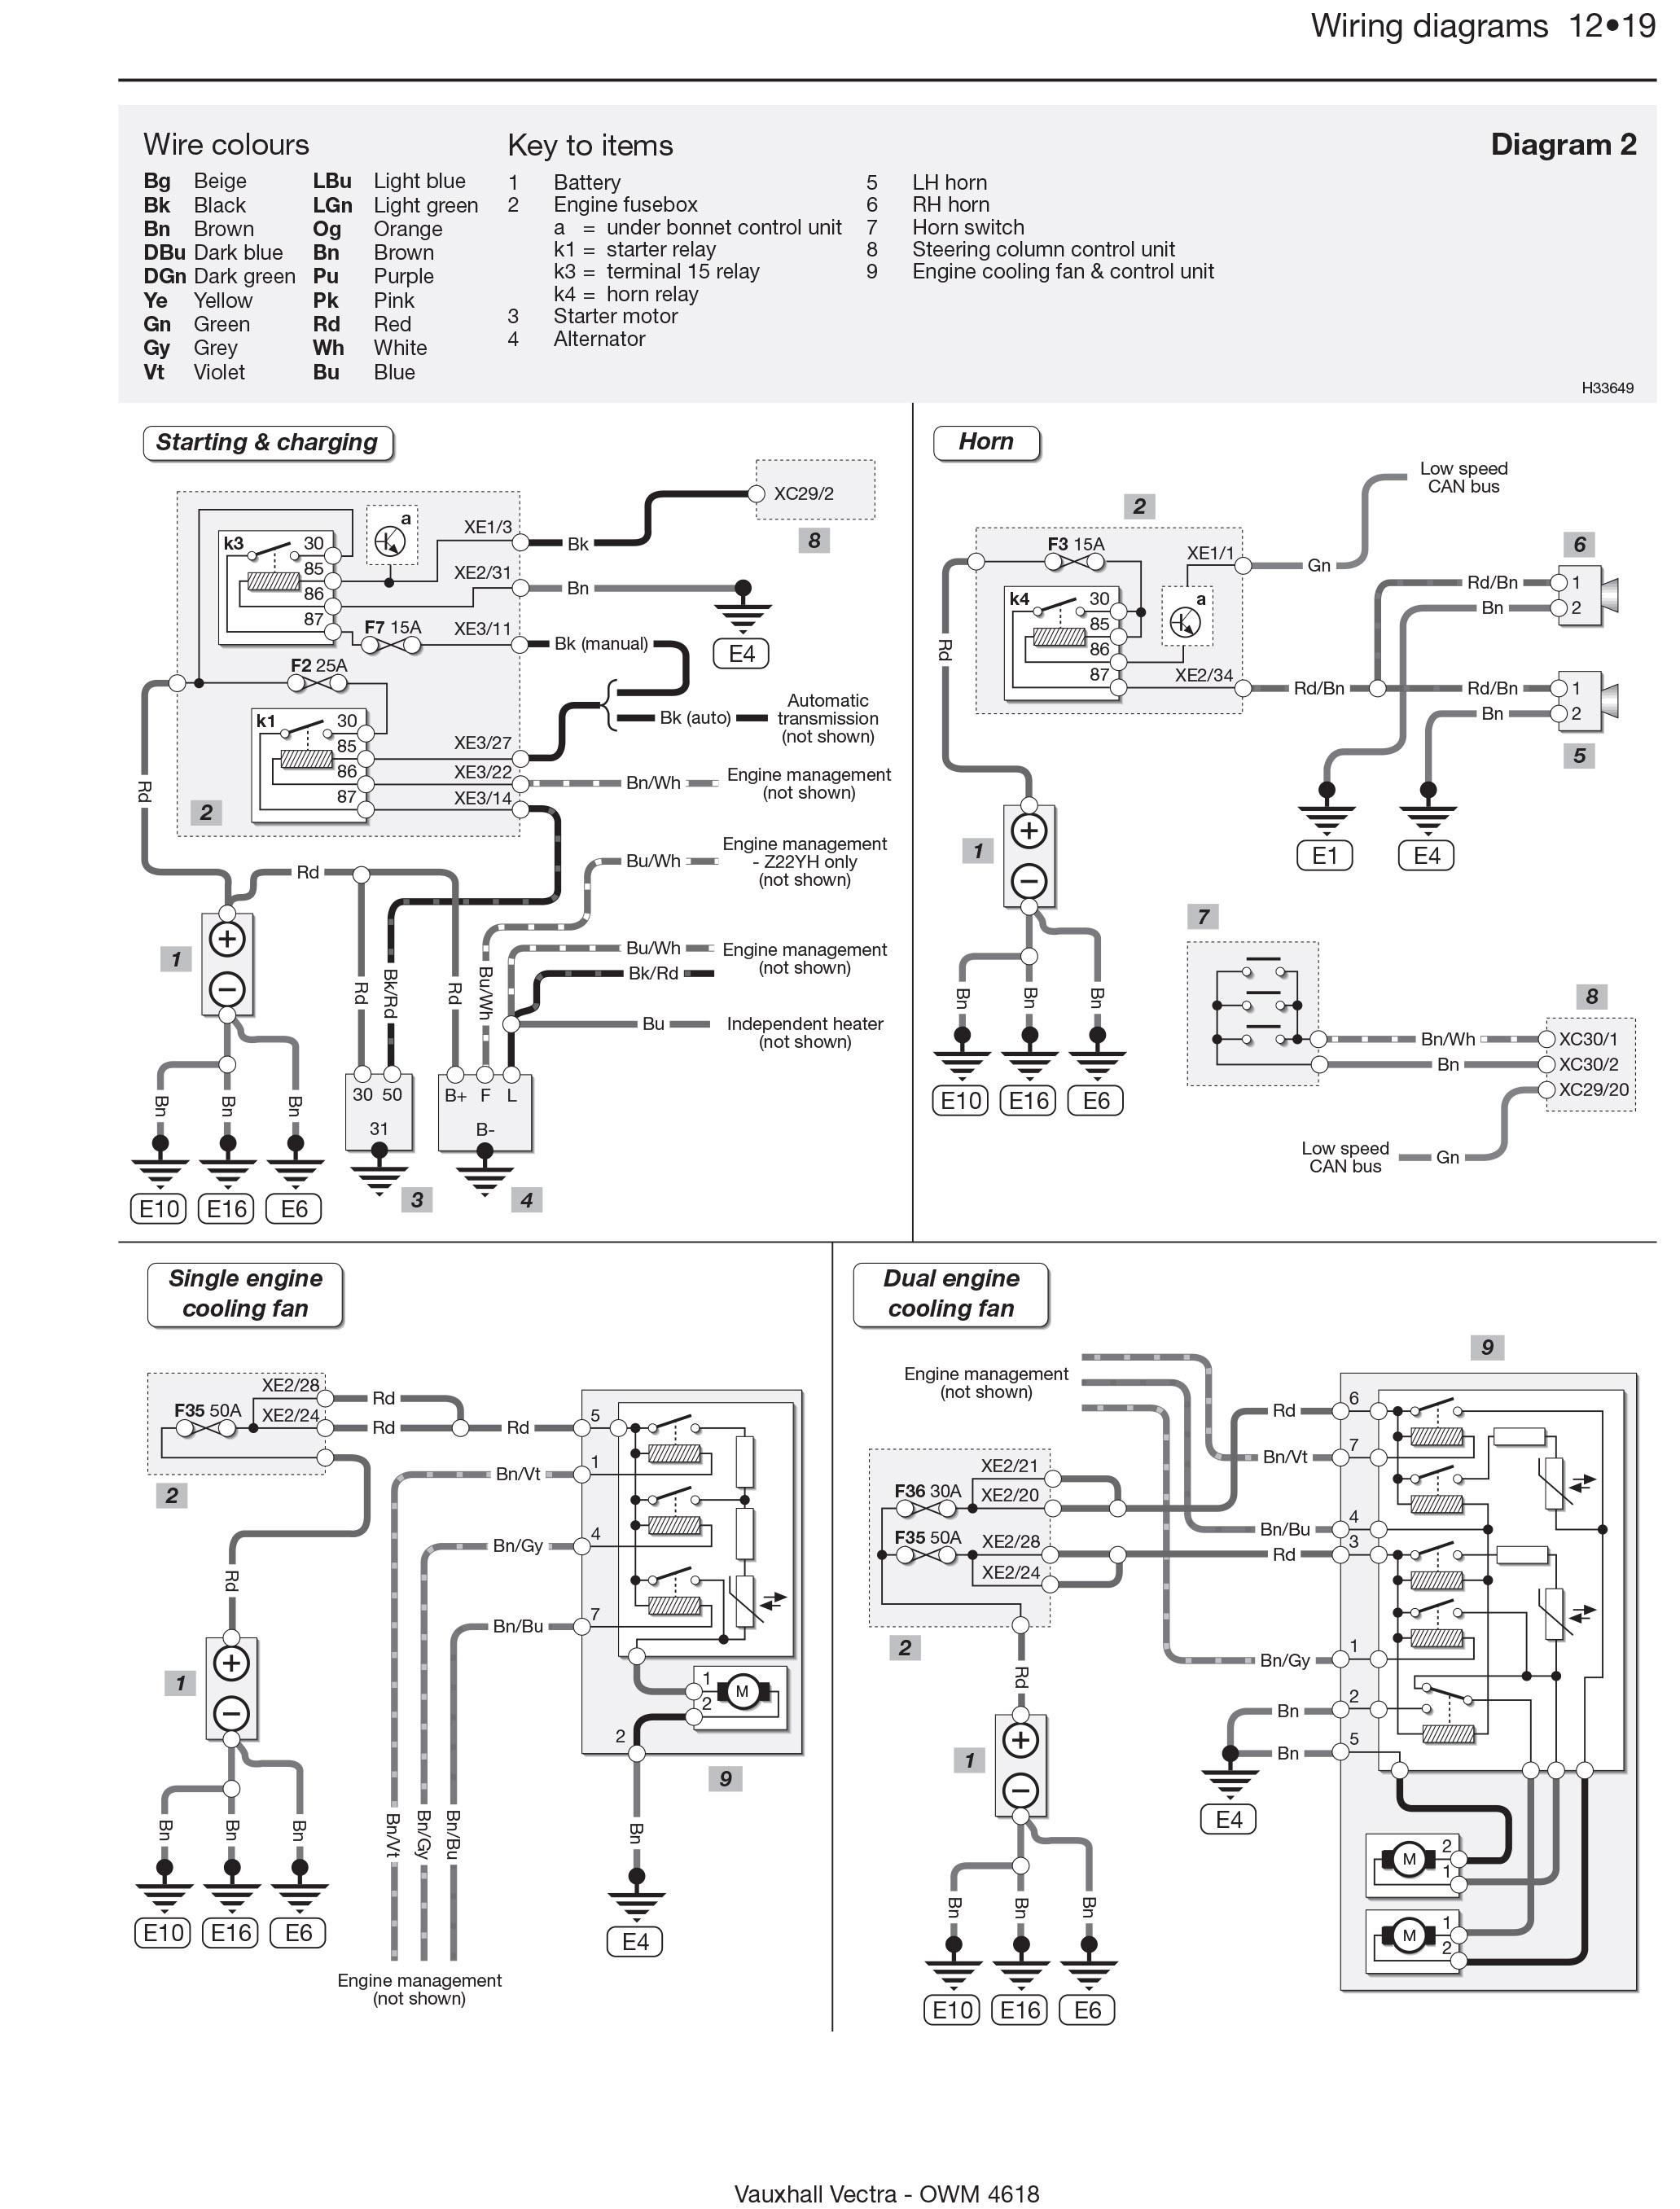 Opel vectra b wiring diagram pdf opel vectra b circuit diagram wiring diagrams schematicsrh